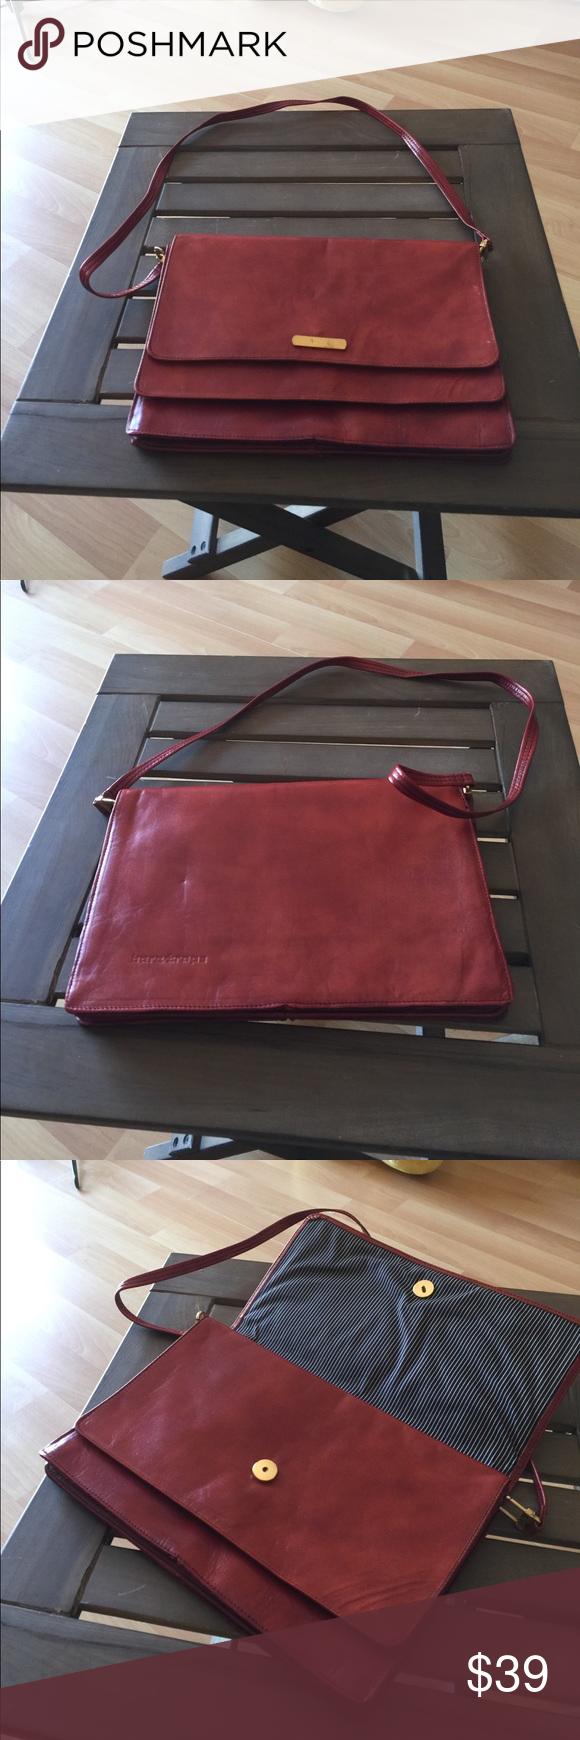 65de7efd9c2 ALDO safari satchel bag